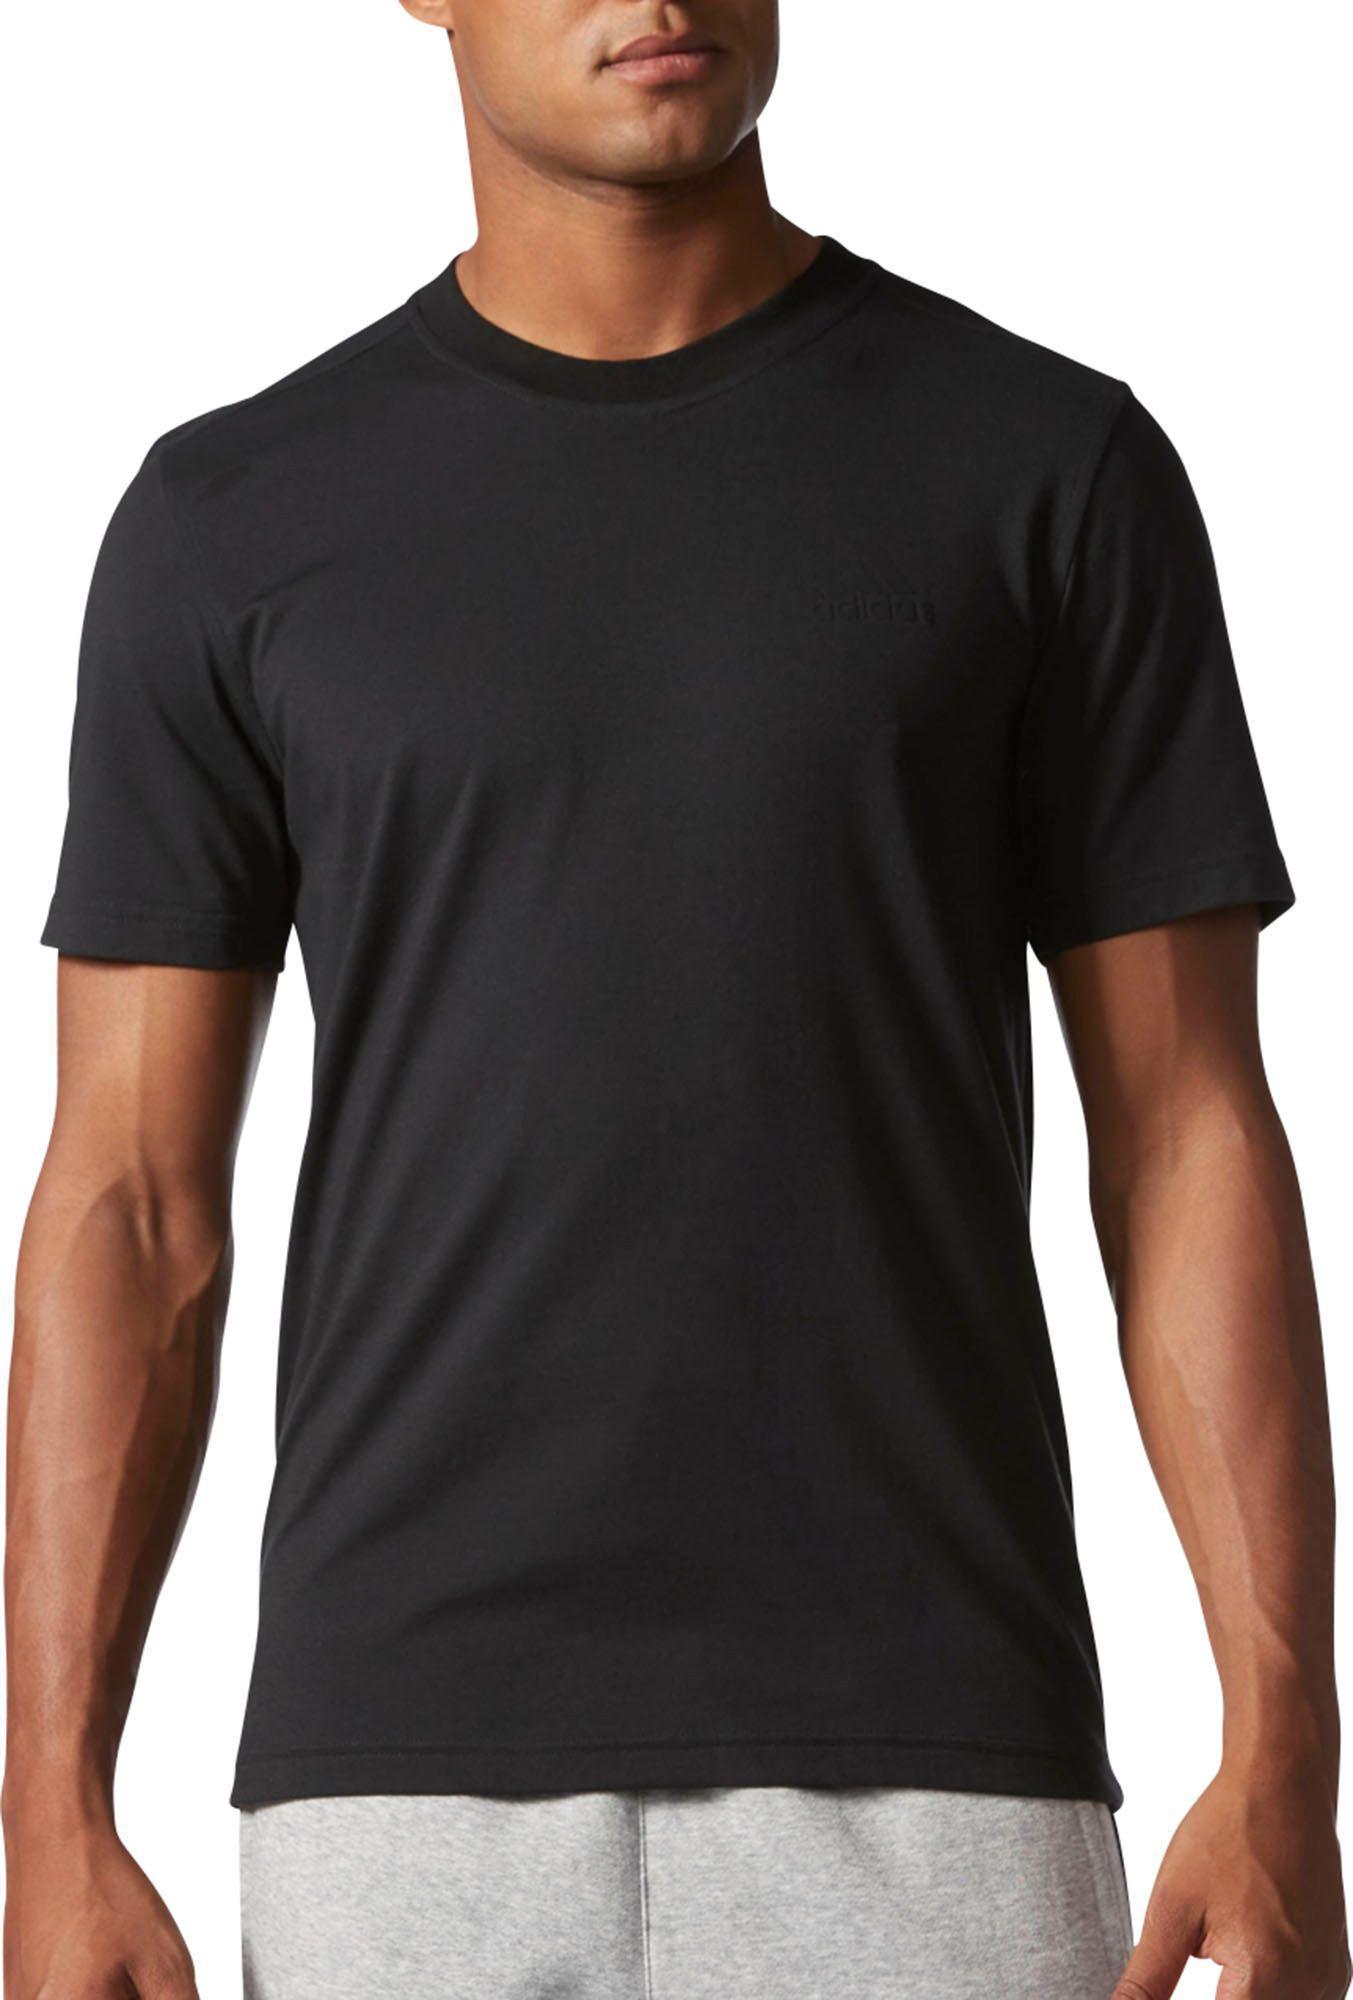 adidas 3 stripe essentials t shirt